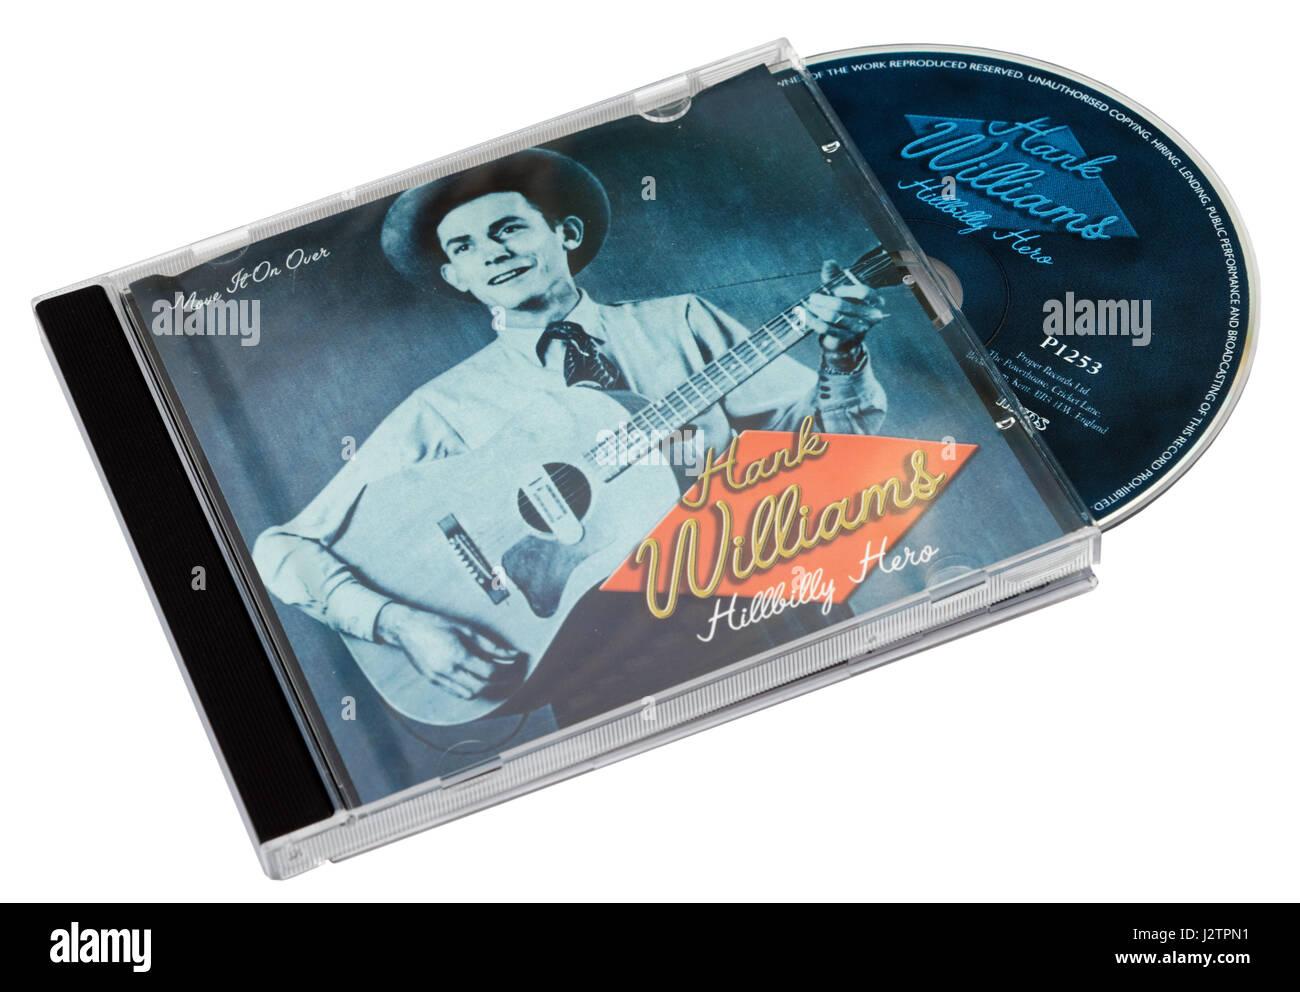 Hillbilly Hero CD by Hank Williams - Stock Image